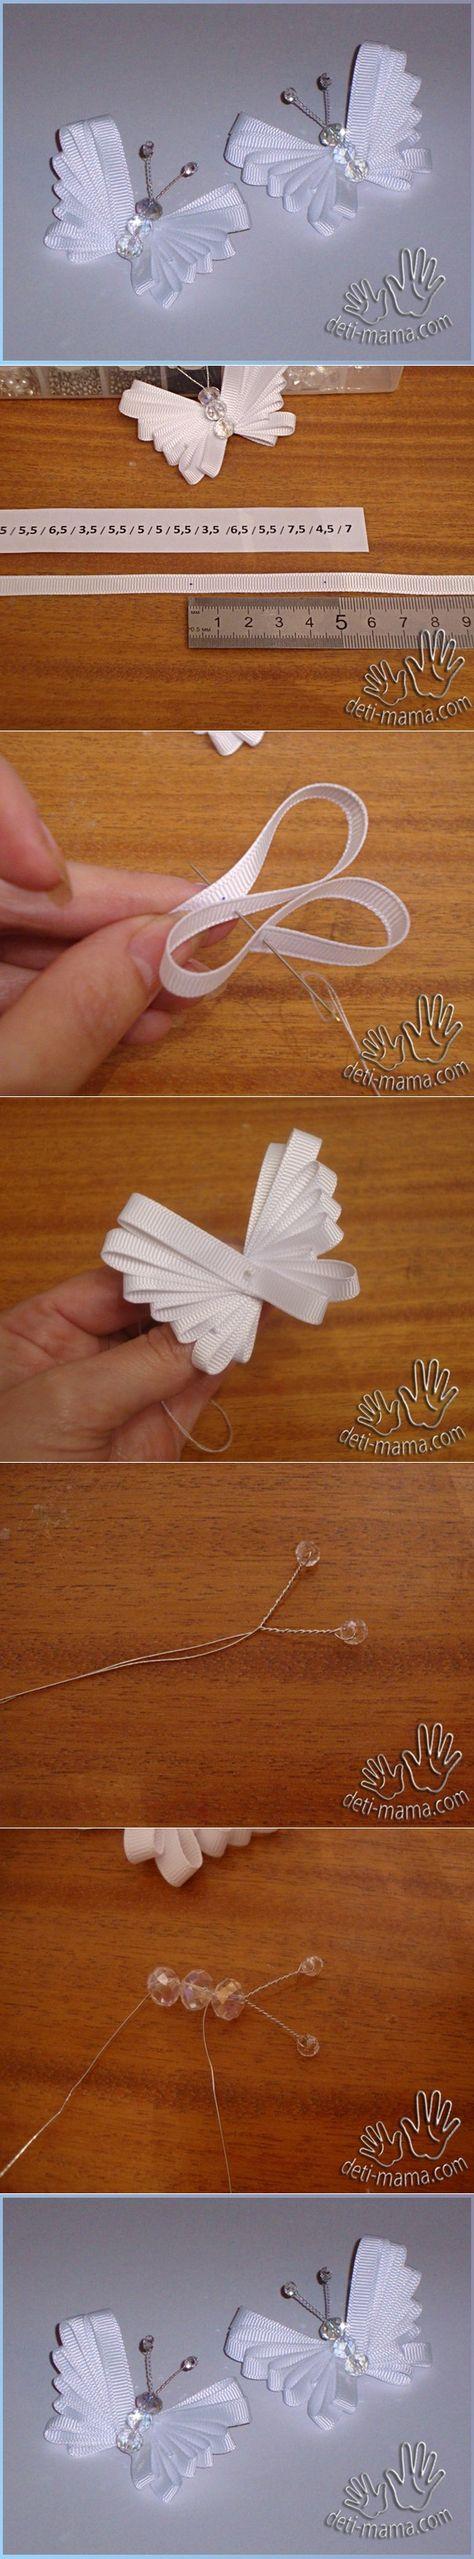 DIY Easy Ribbon Butterfly | www.FabArtDIY.com LIKE Us on Facebook ==> https://www.facebook.com/FabArtDIY